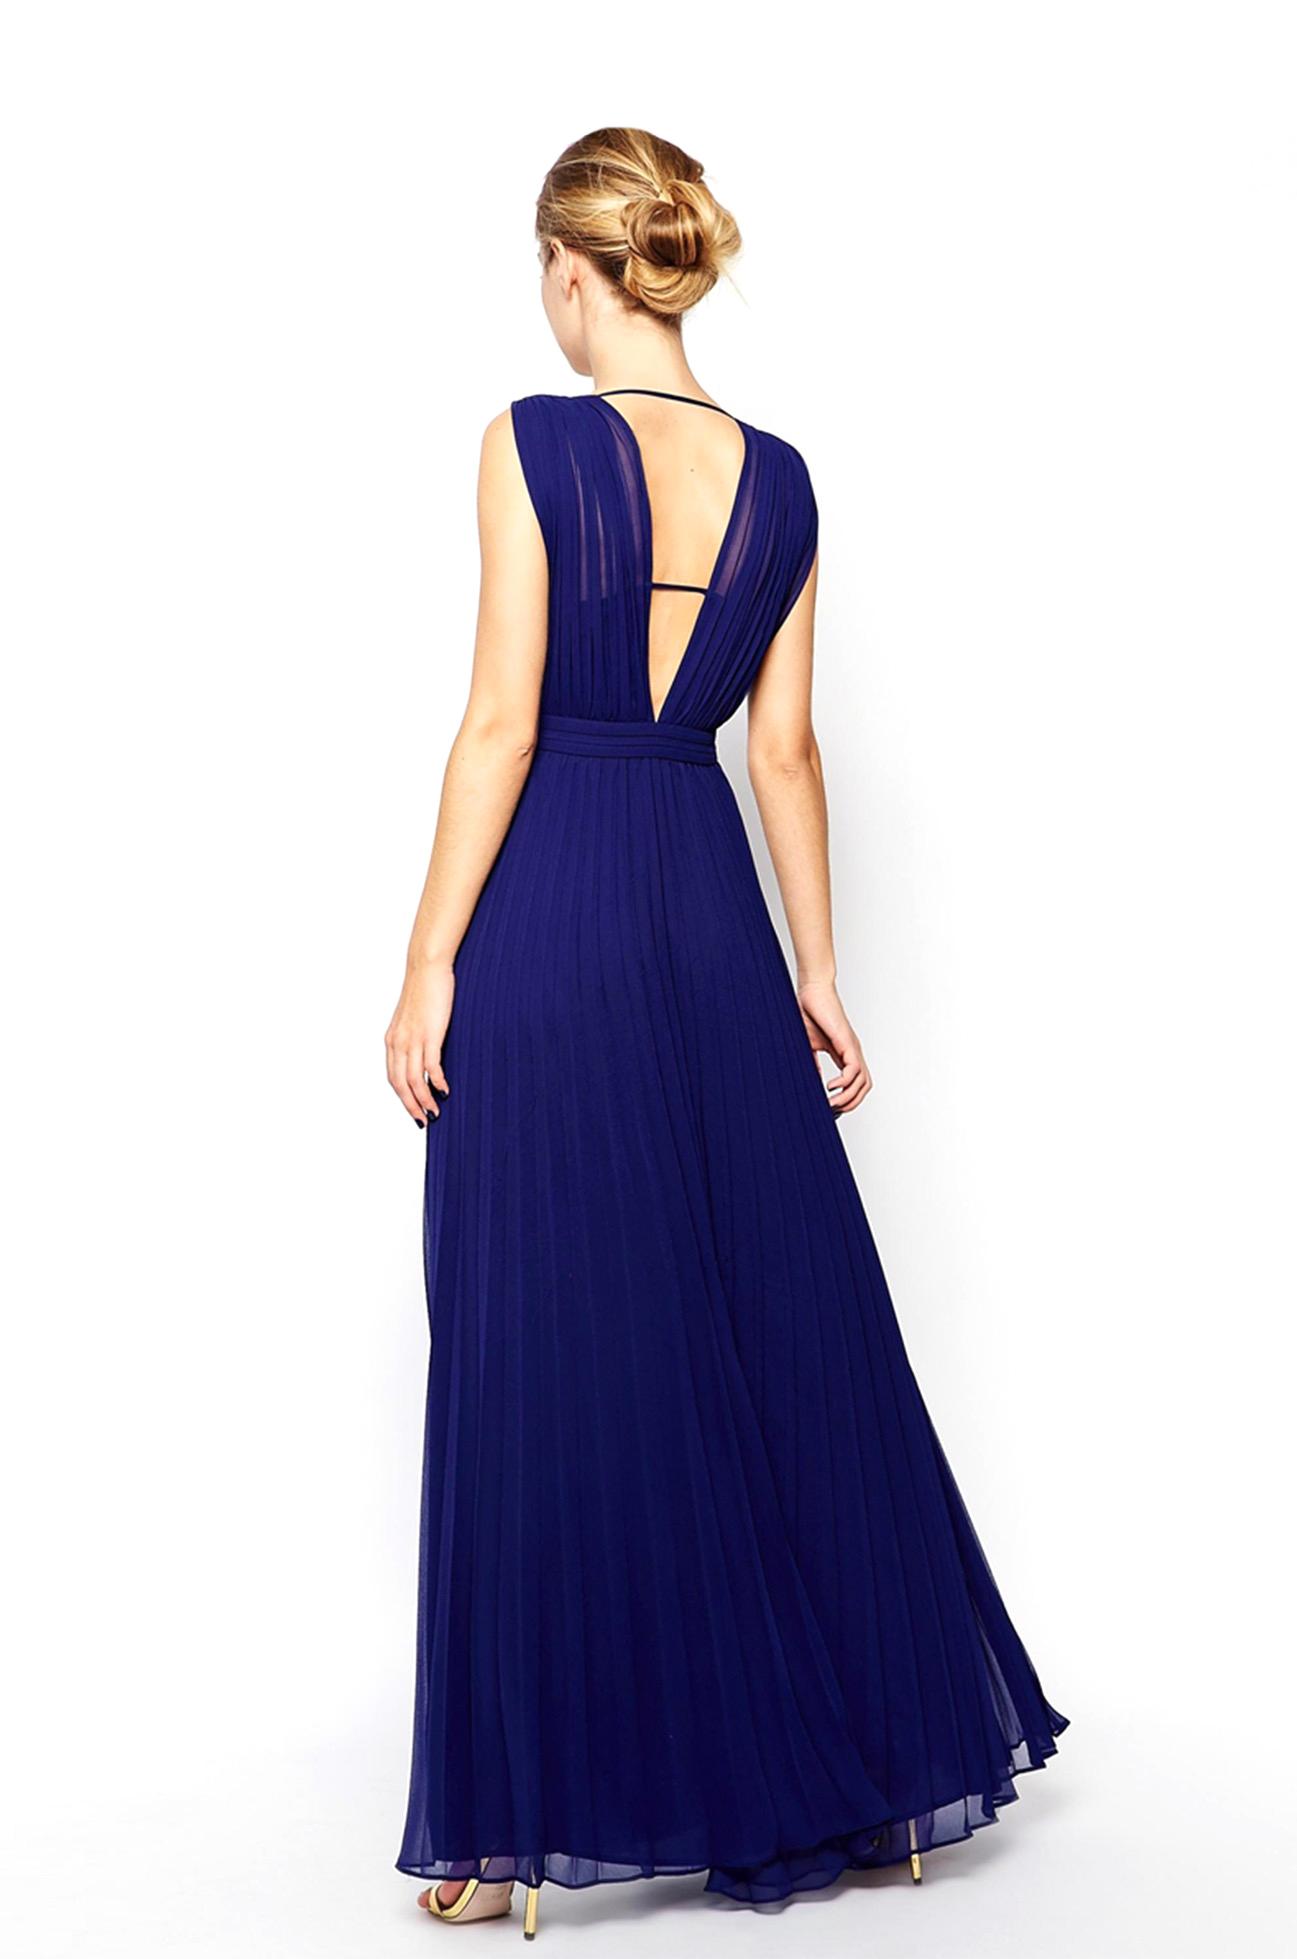 Robe Bleu Nuit Adress Collection